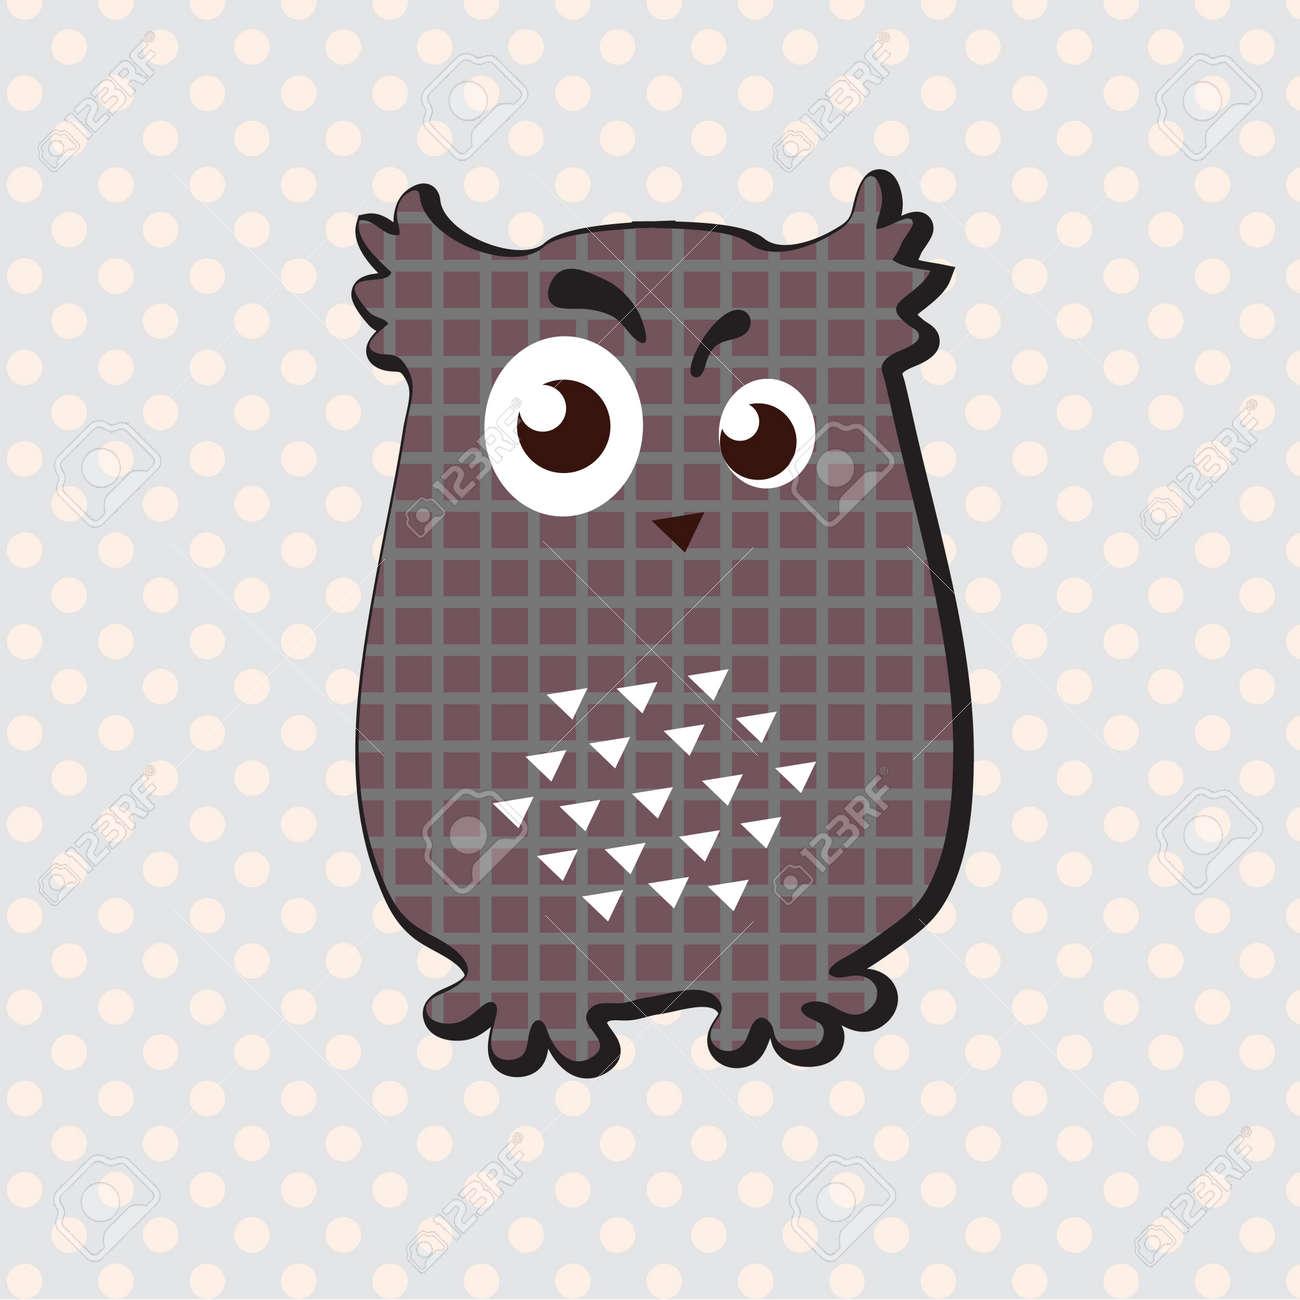 Decorative owl with interesting look  Vector art Stock Vector - 17224276